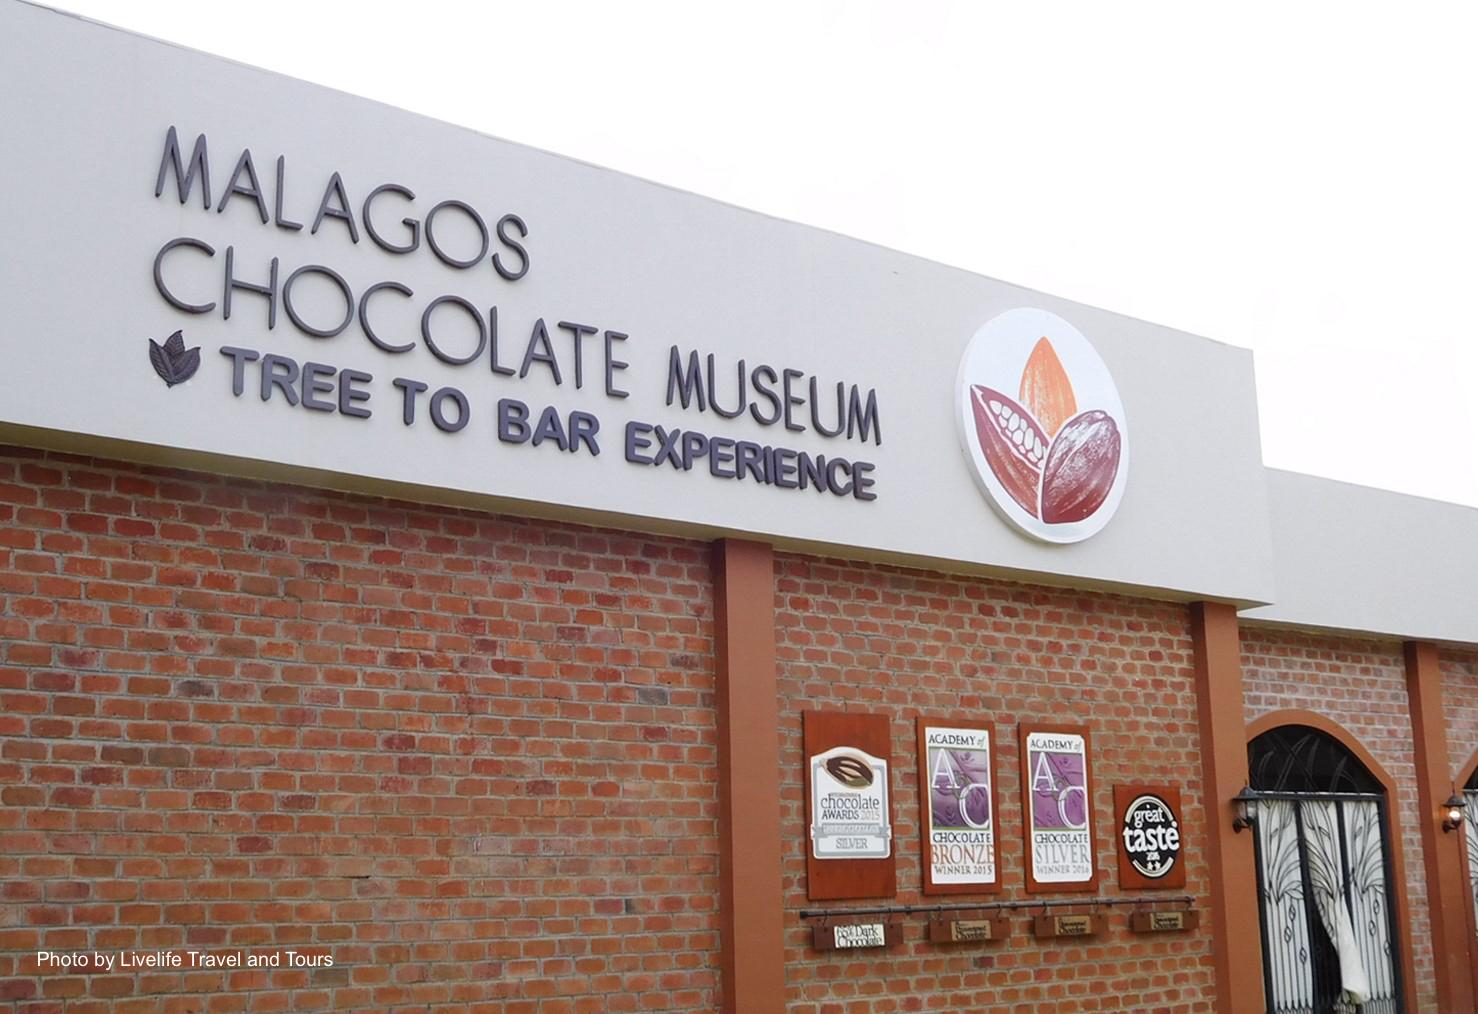 Malagos Chocolate Museum in Davao